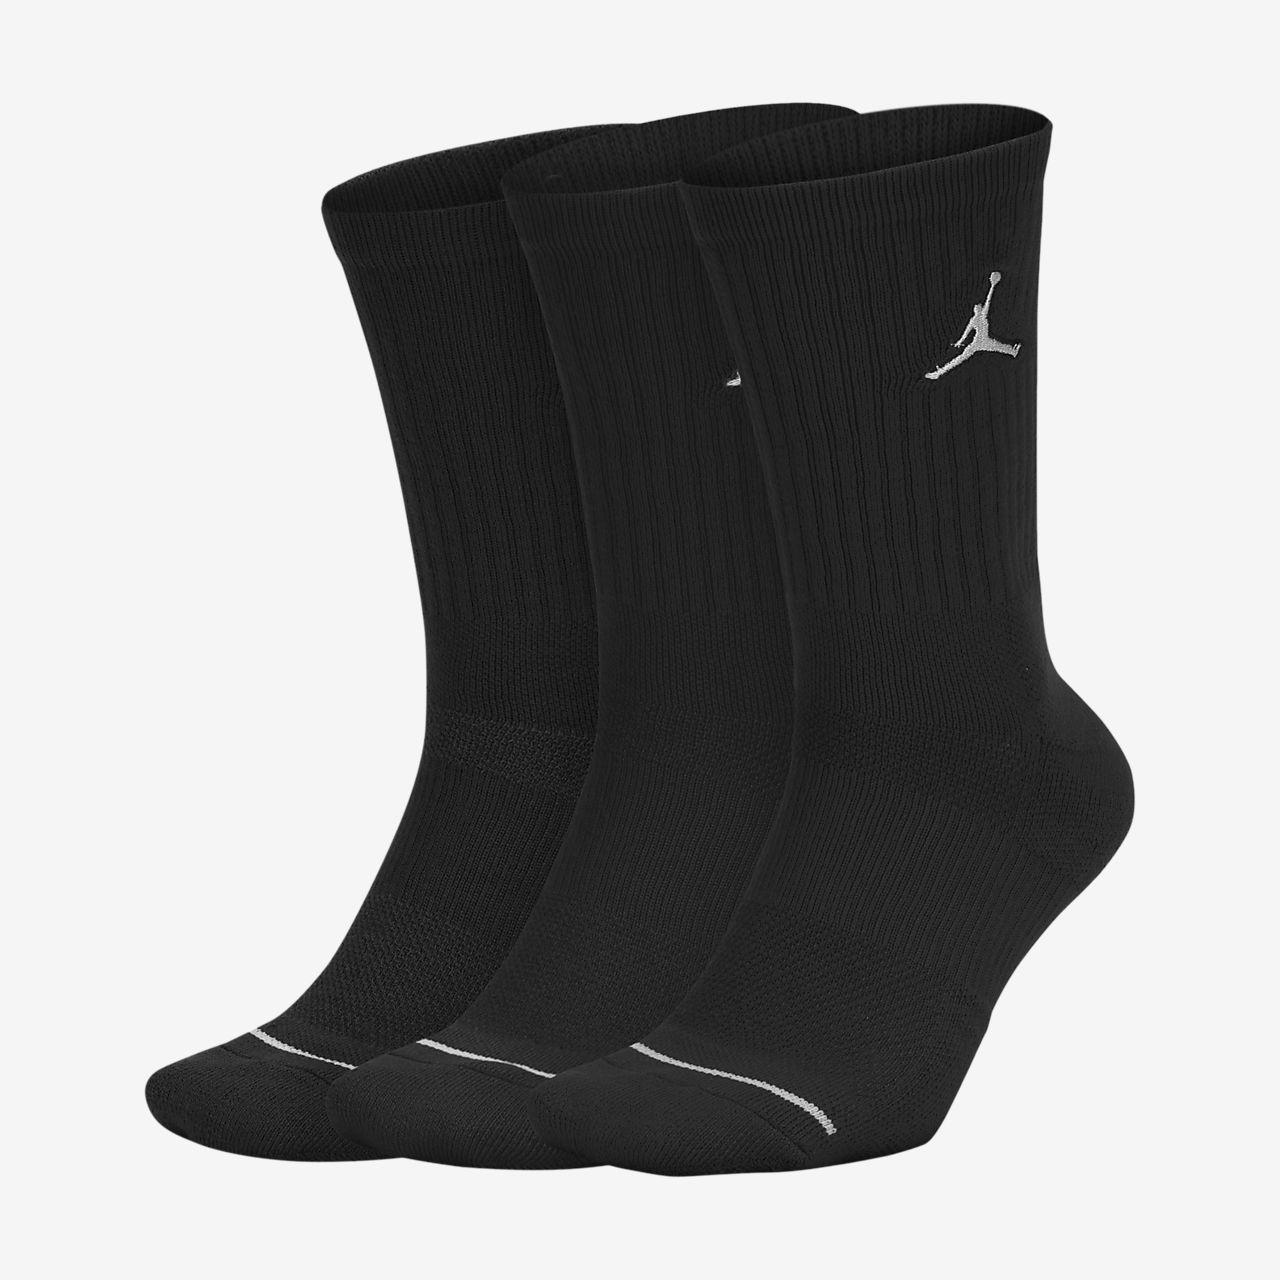 a5590c3c61b25 Calze da basket Jordan Jumpman Crew (3 paia). Nike.com IT